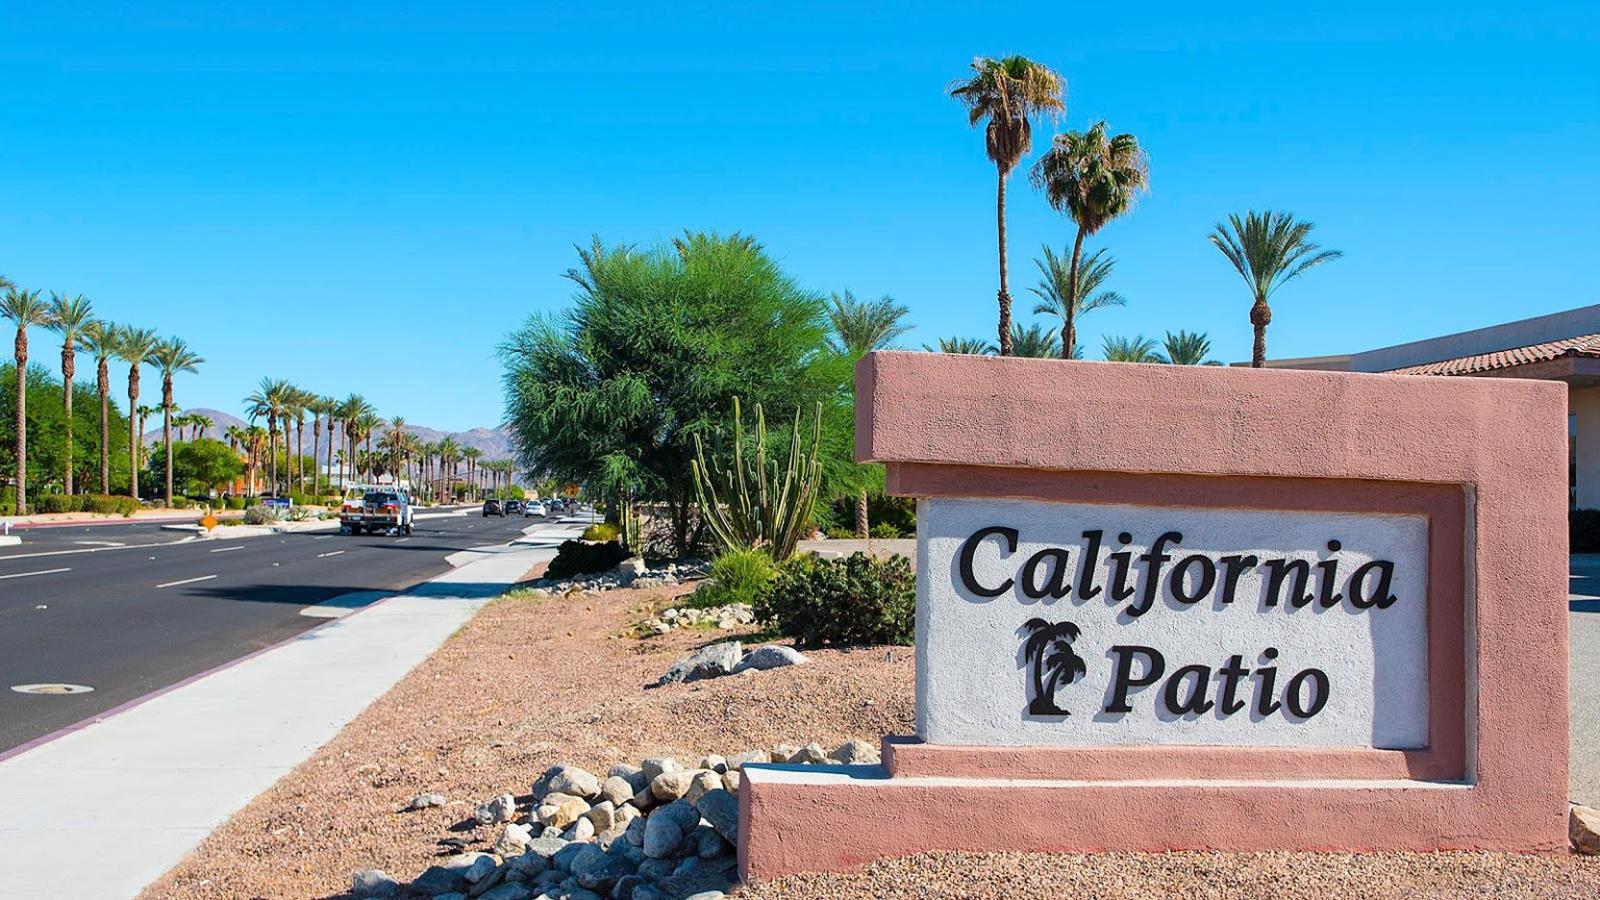 California Patio Storefront Rancho Mirage, CA